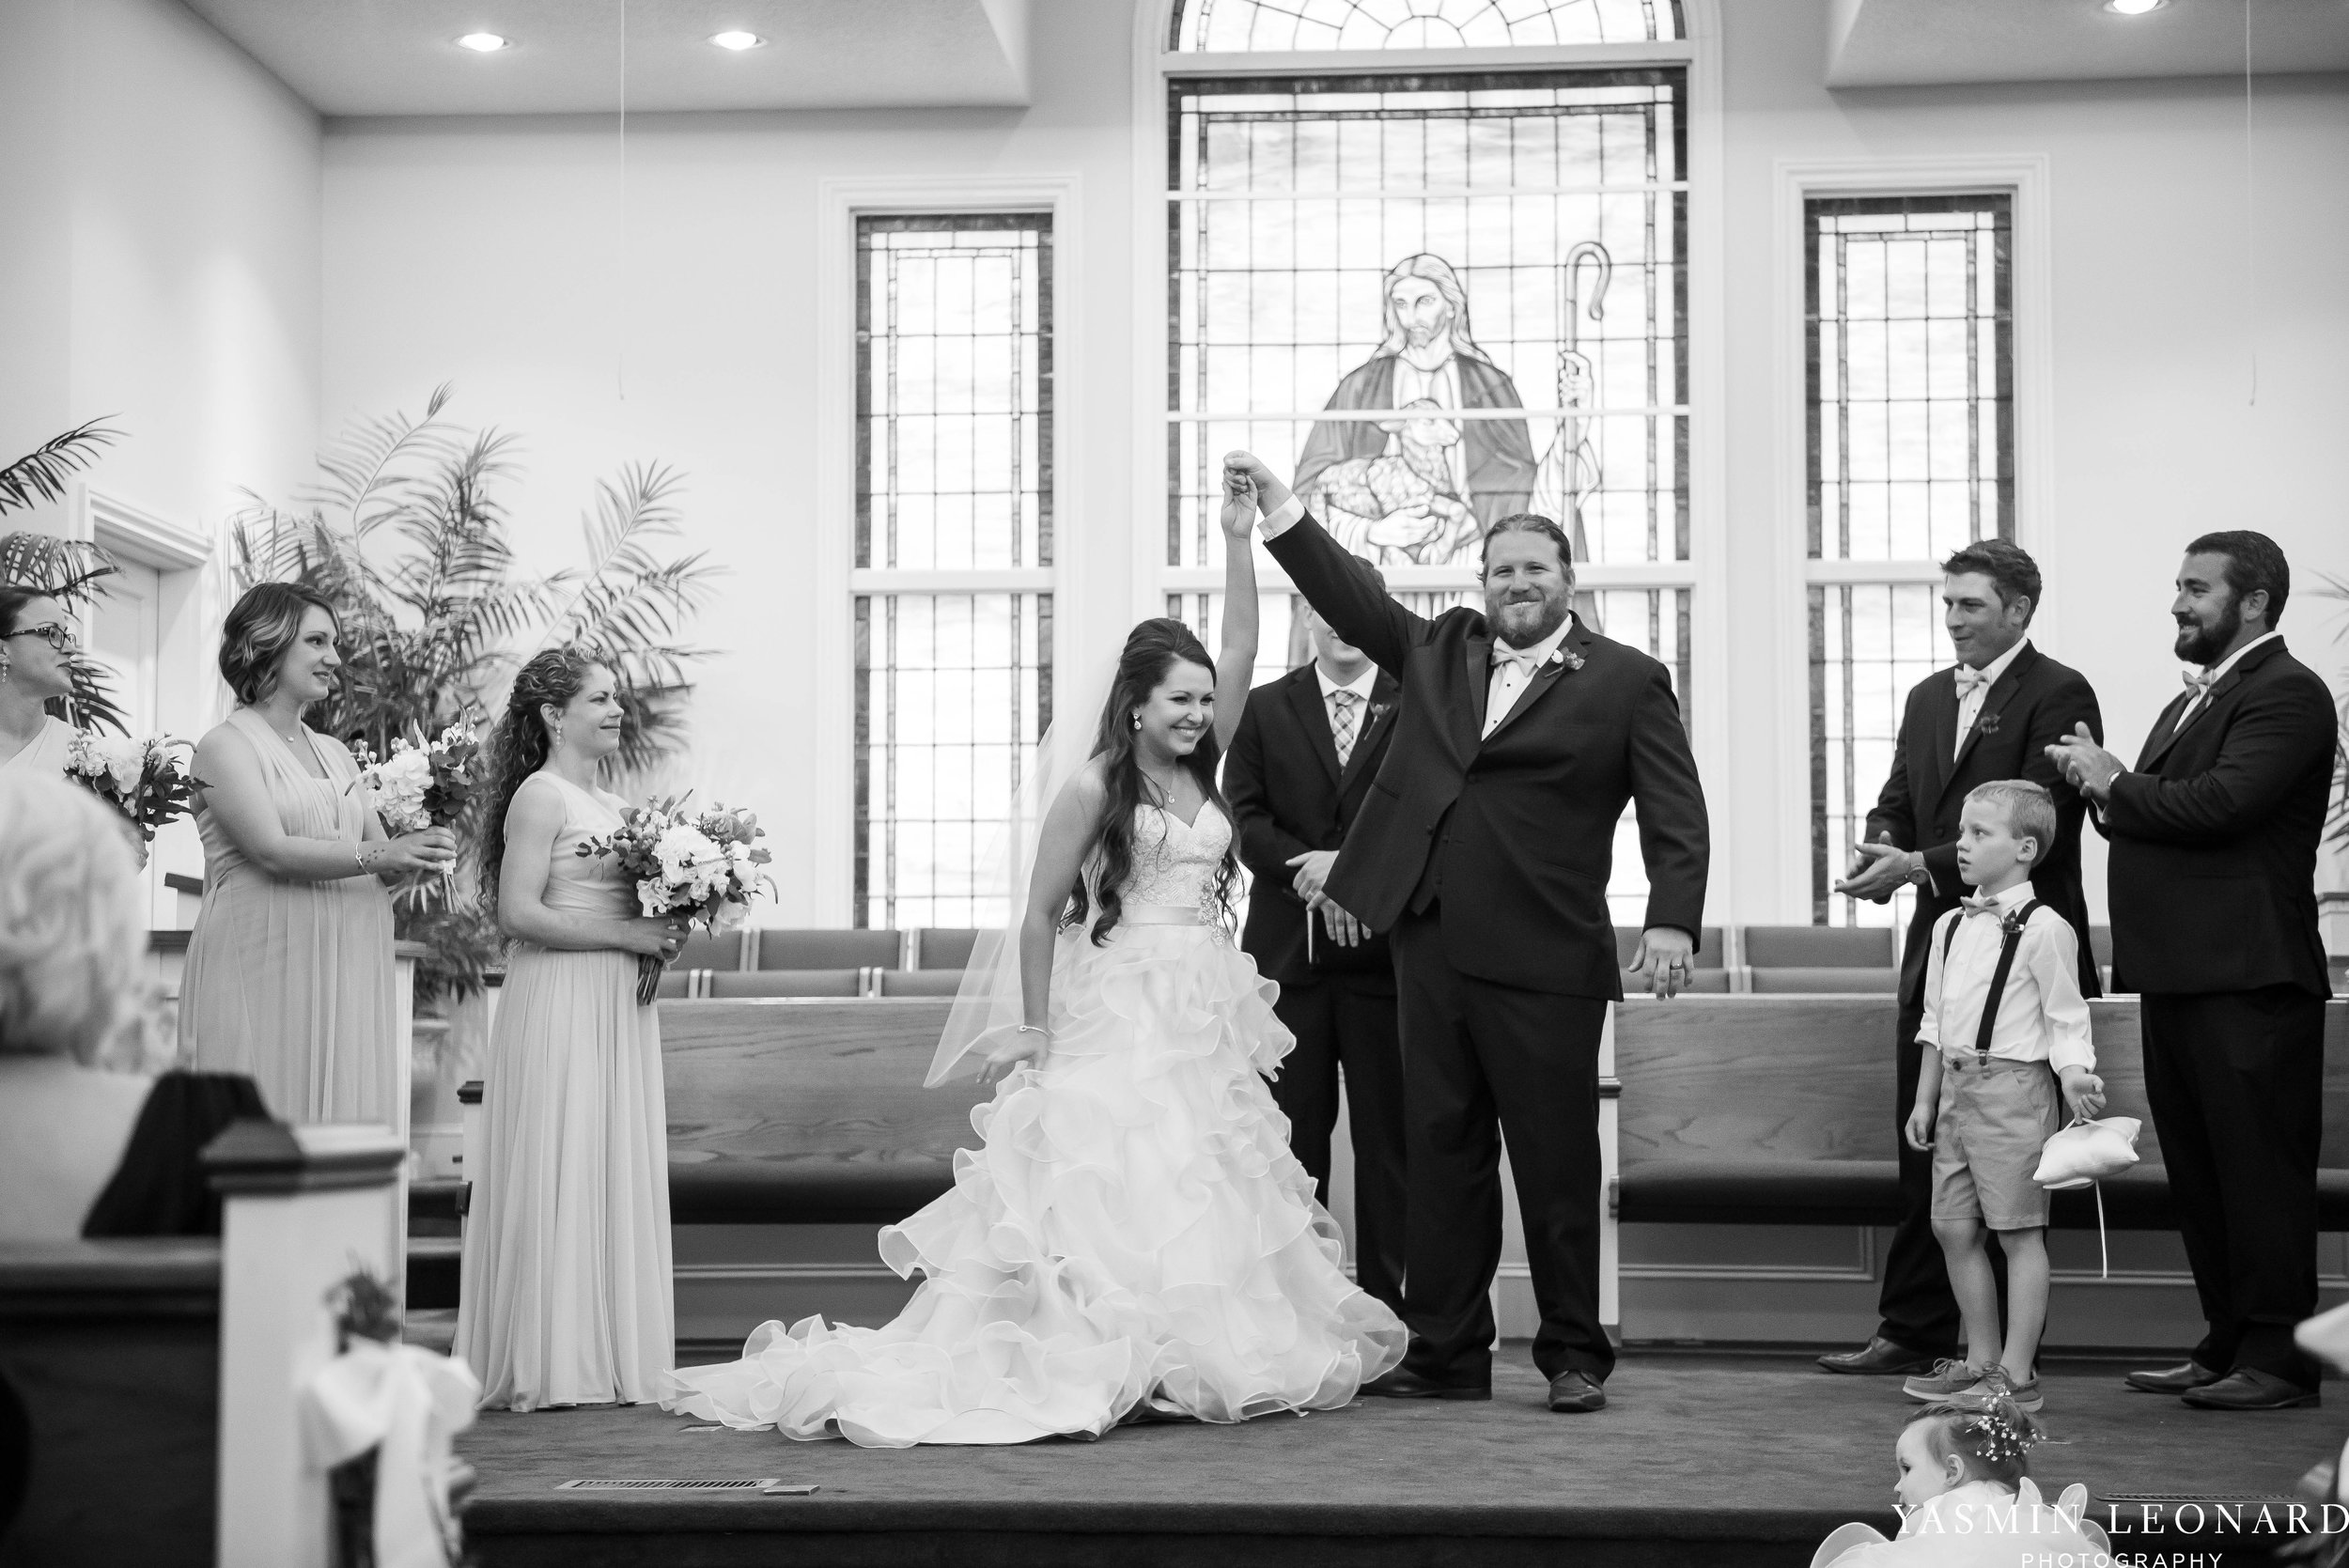 Rain on your wedding day - Rainy Wedding - Plan B for Rain - What to do if it rains on your wedding day - Wedding Inspiration - Outdoor wedding ideas - Rainy Wedding Pictures - Yasmin Leonard Photography-26.jpg